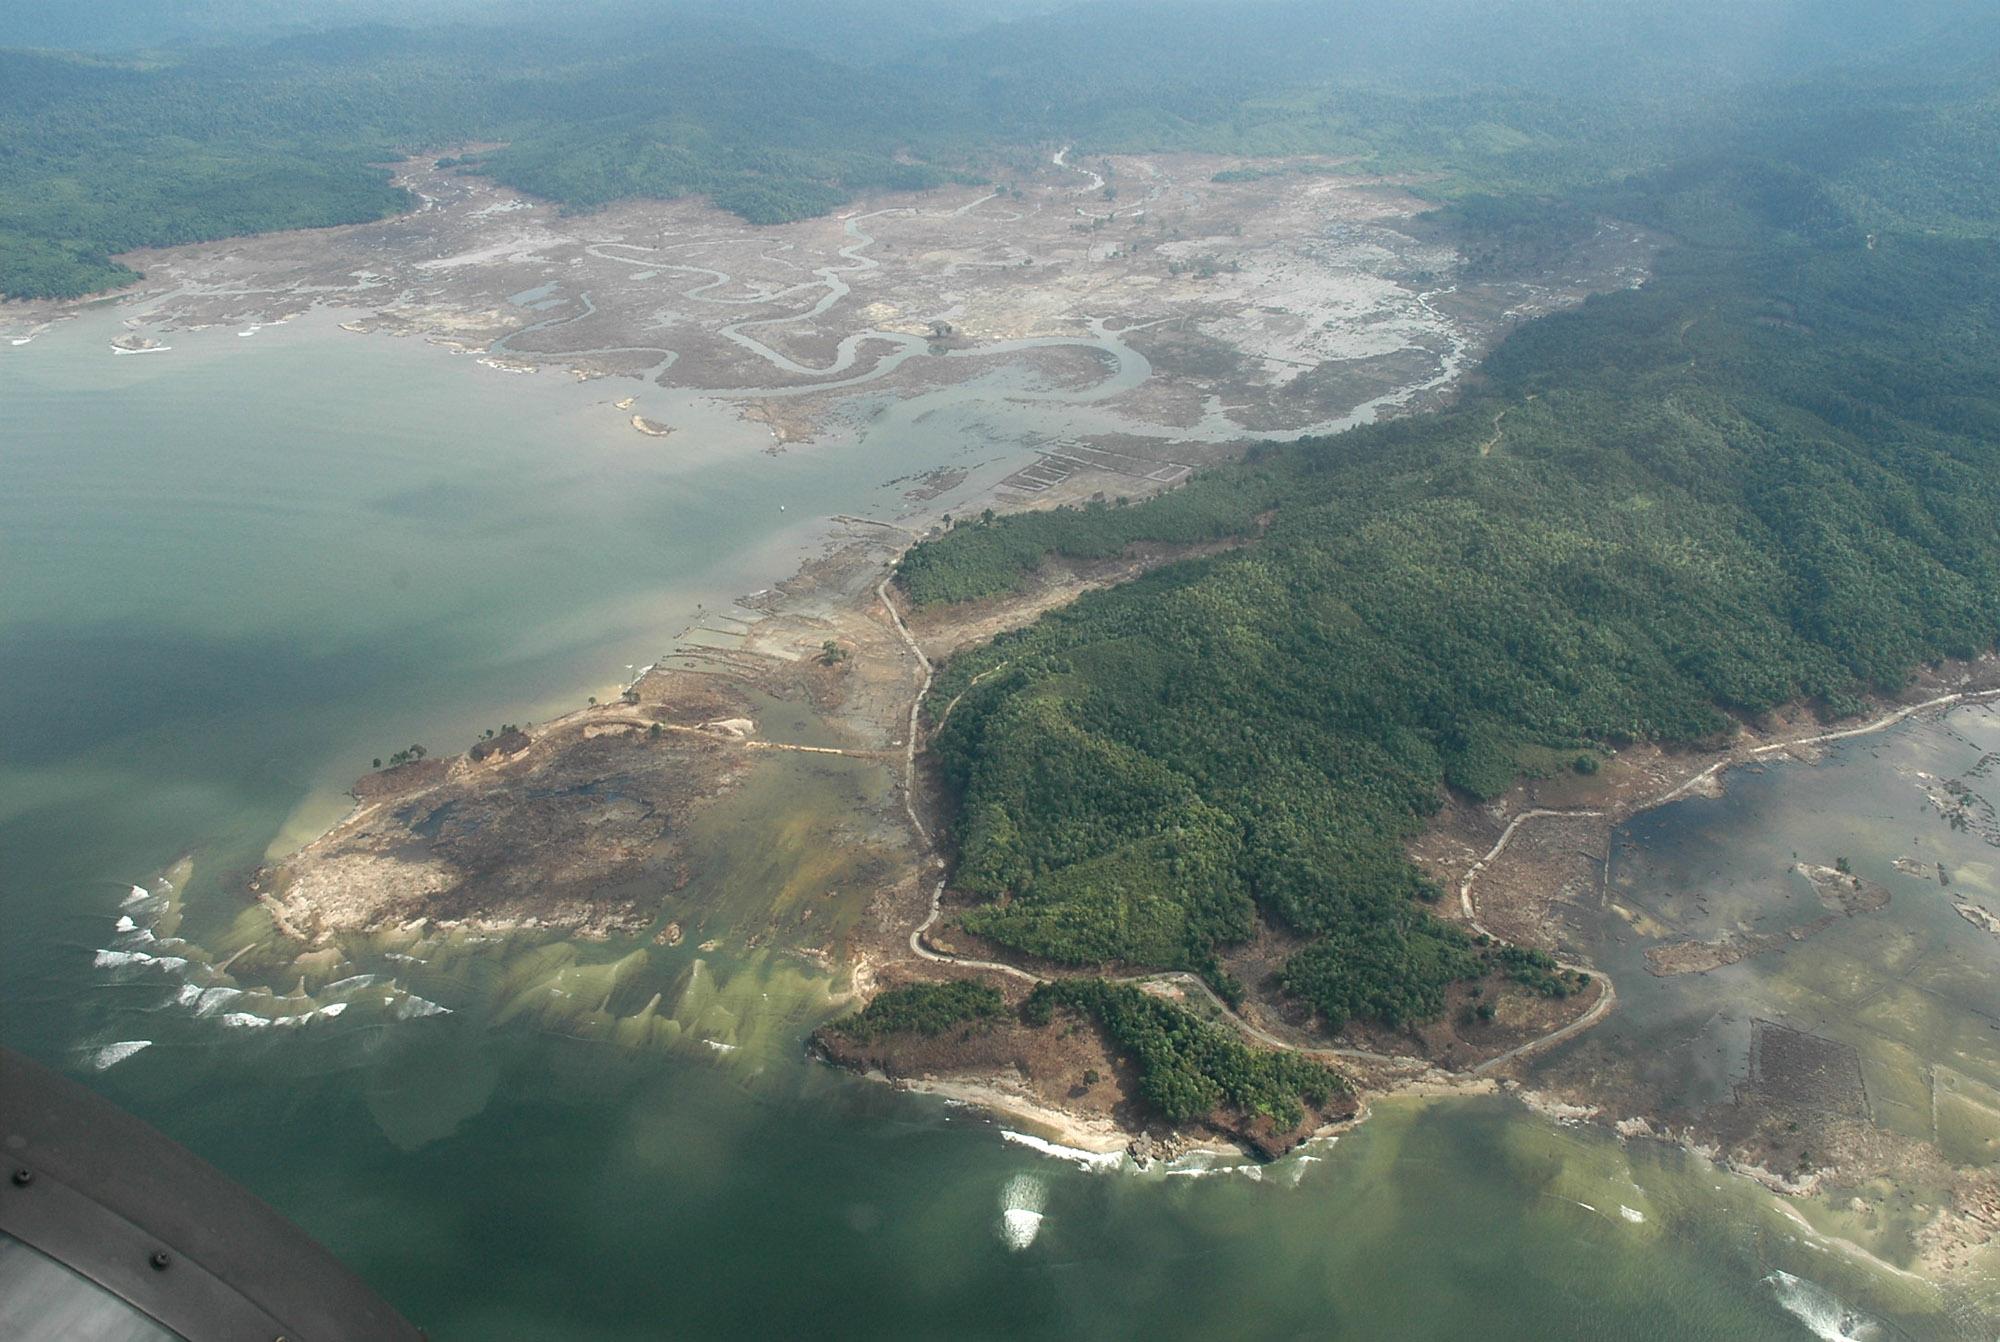 Indonesia-Shoreline-After-Tsunami-2005-AP_05010103803-Dudi Anung